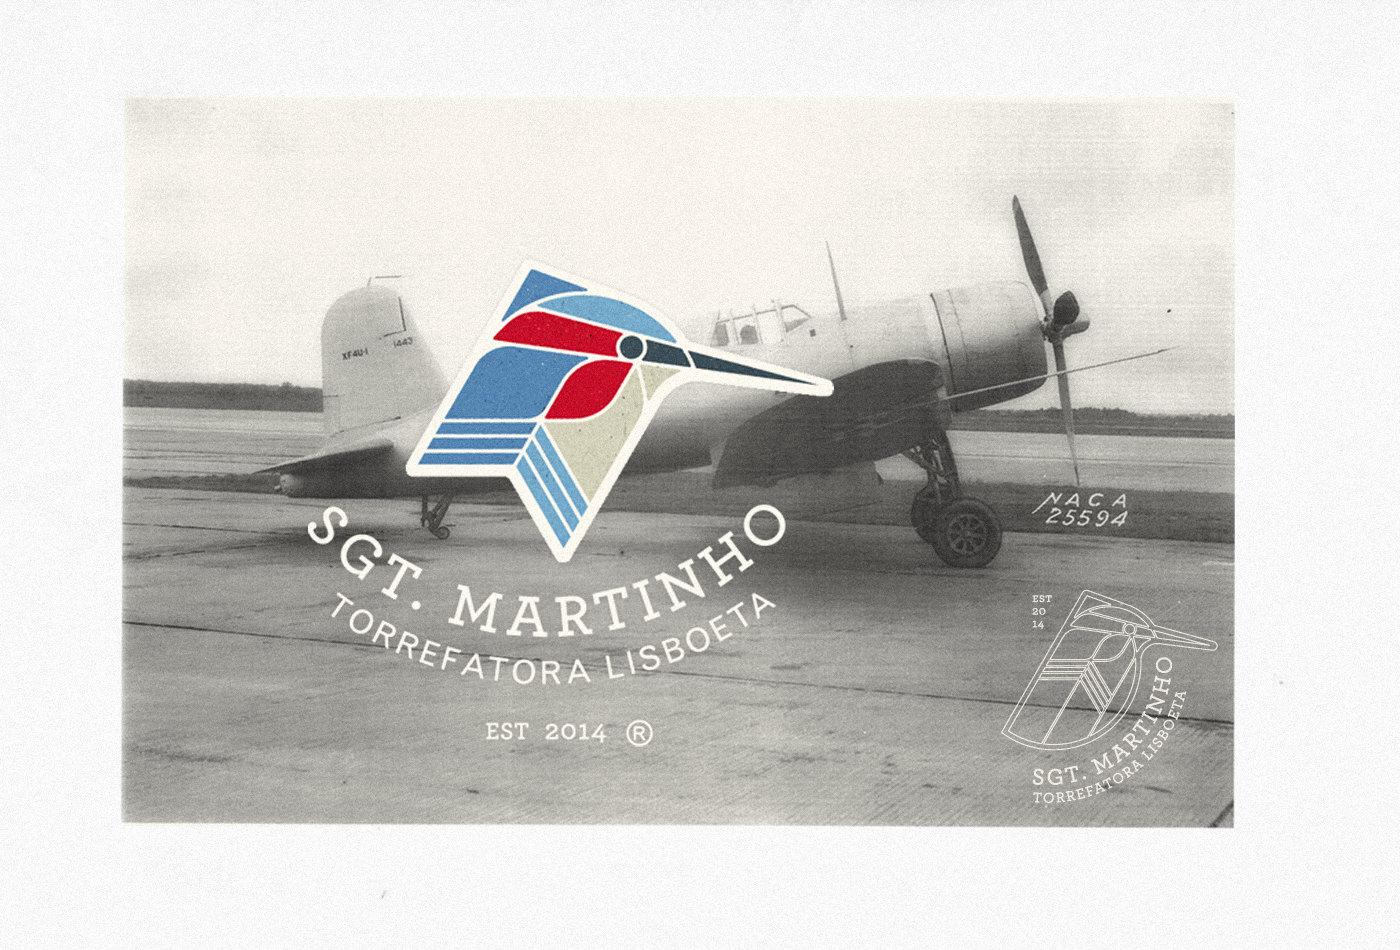 07-sargento-sergeant-martinho-coffee-brand-marks-logo-vacaliebres